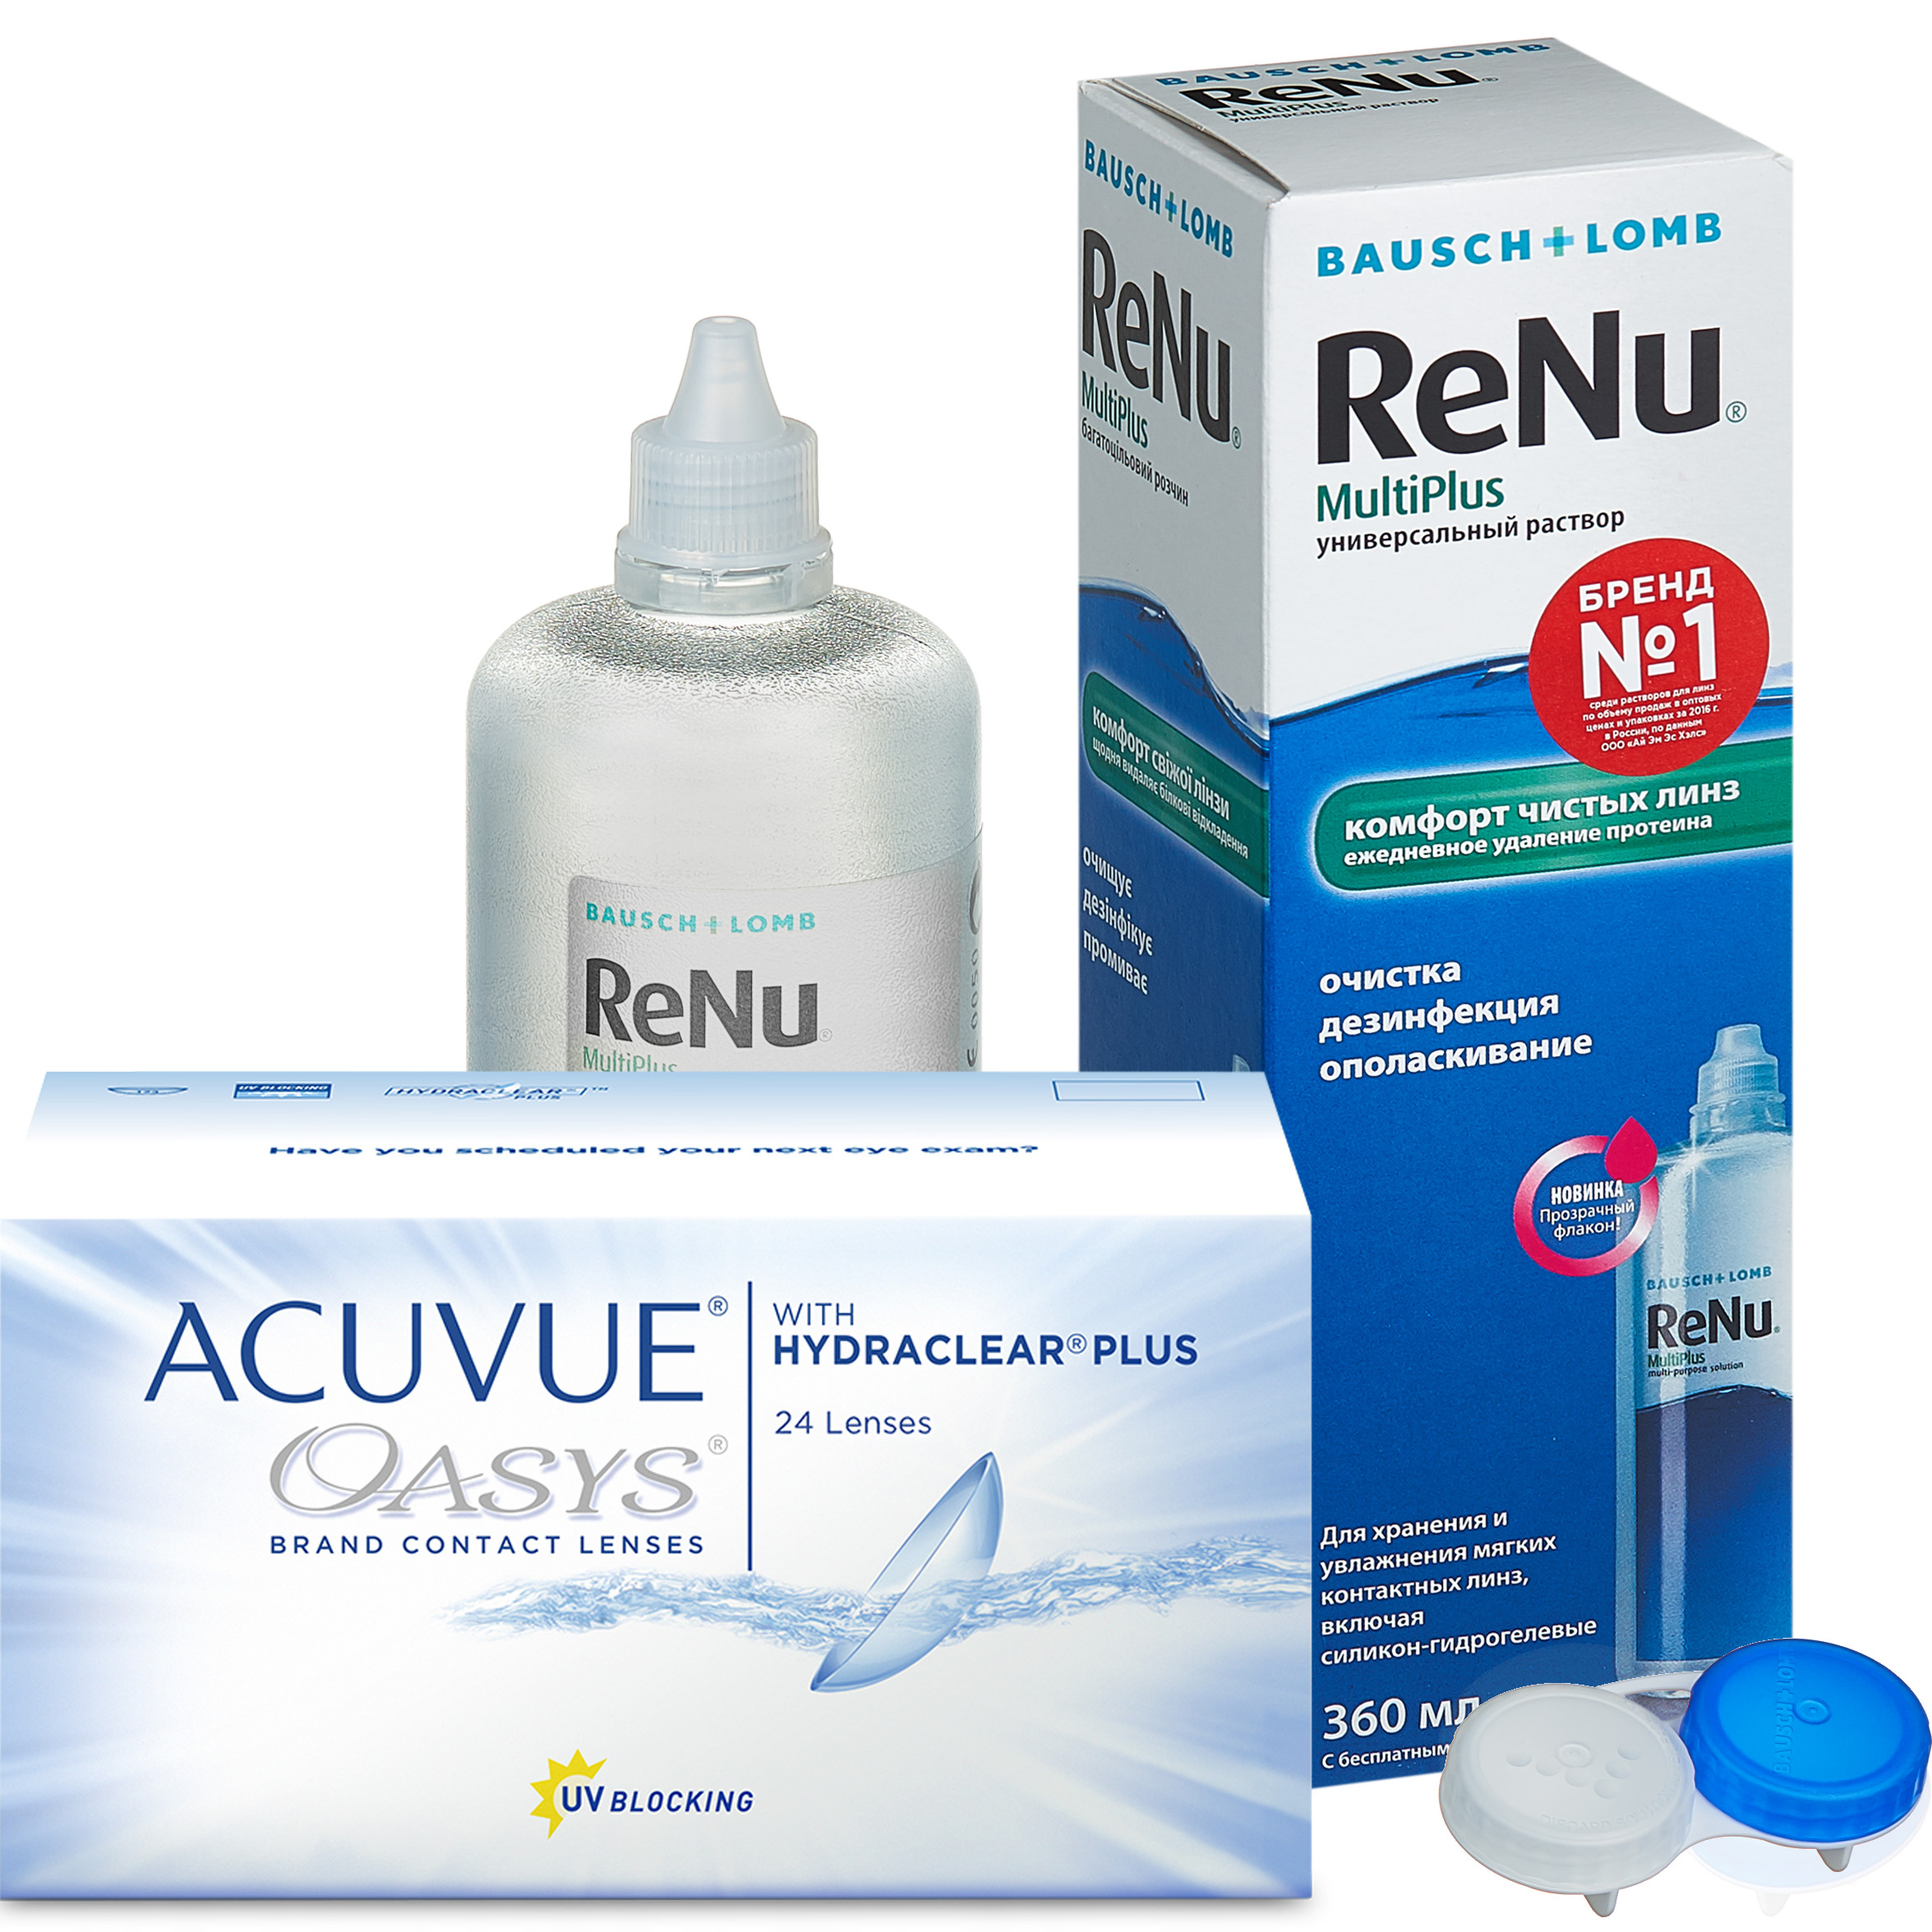 Купить Oasys with Hydraclear Plus 24 линзы + ReNu MultiPlus, Линзы Acuvue Oasys with Hydraclear Plus 24 линзы R 8.8 +5, 50 + ReNu Multi Plus 360 мл